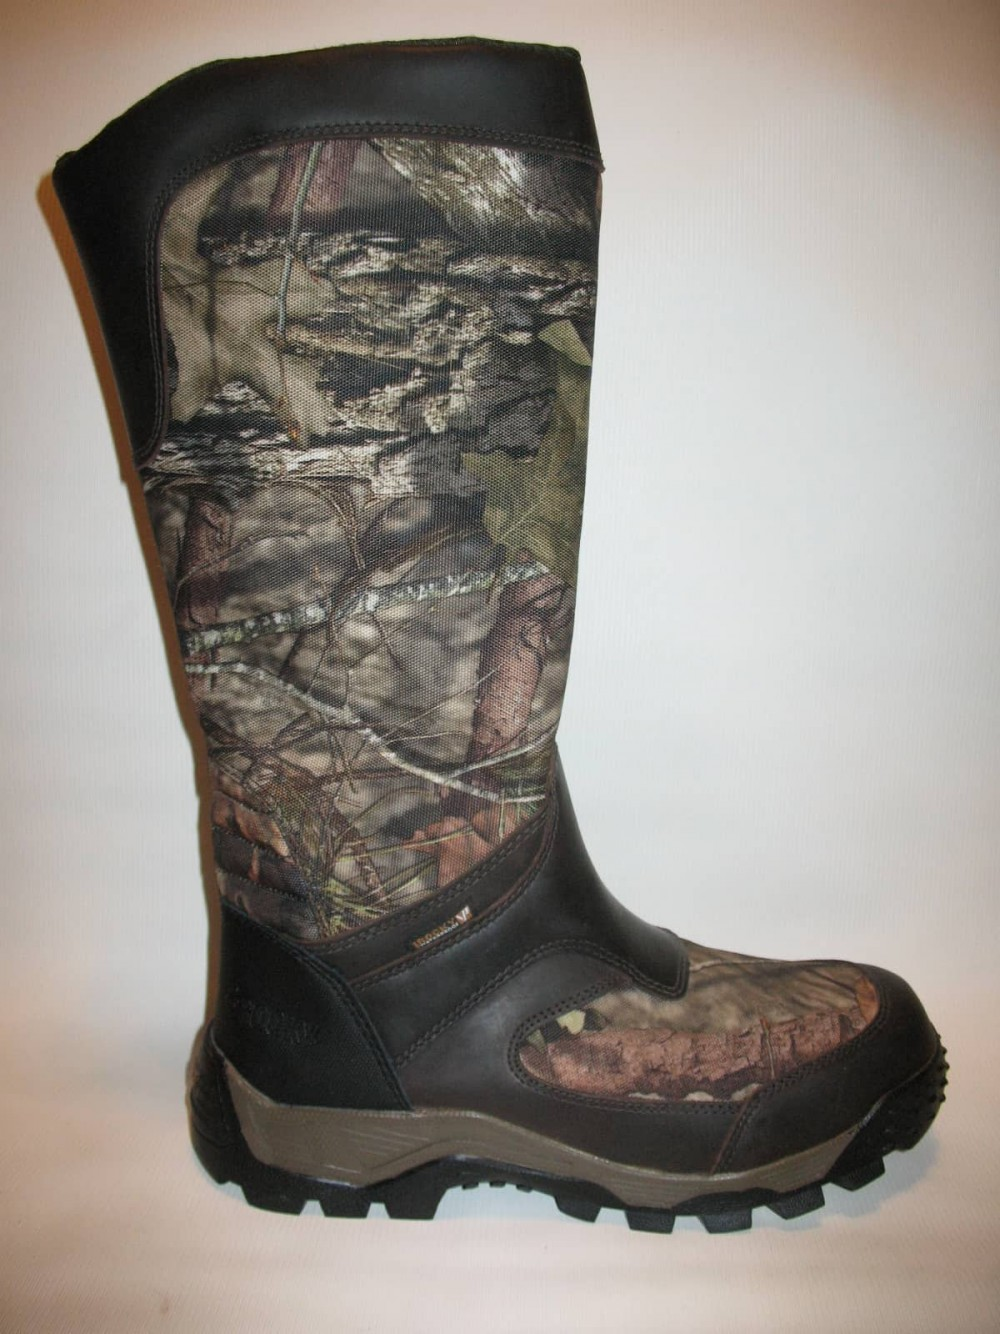 Ботинки ROCKY snake sport pro 16 boots (размер UK7,5/US8,5/EU42(на стопу до 270 mm)) - 6